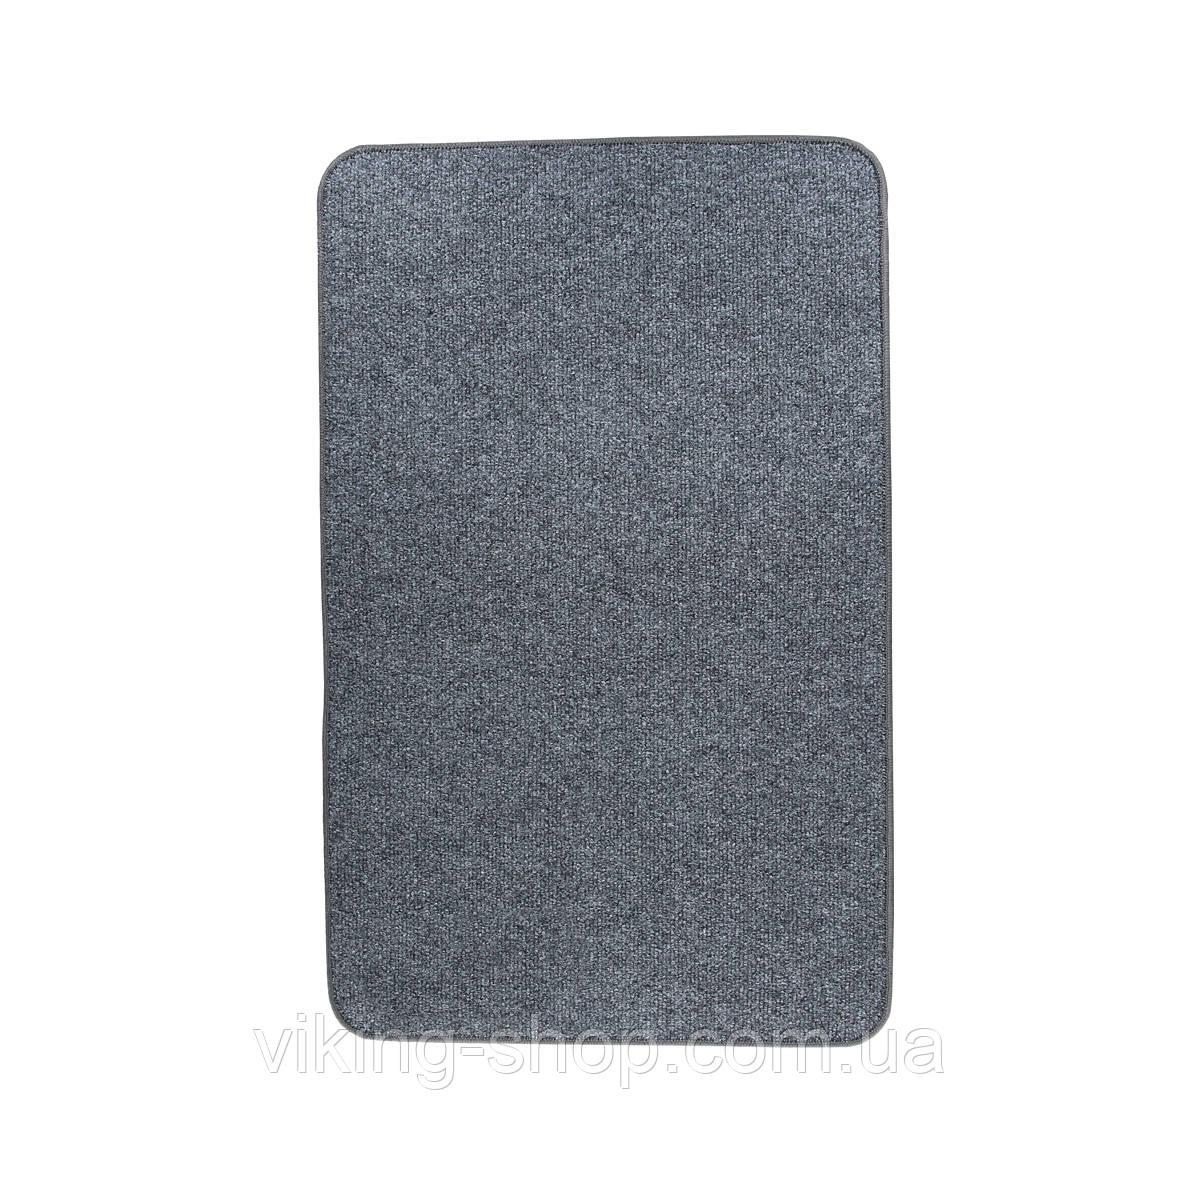 Коврик с подогревом 50х80см - теплый коврик